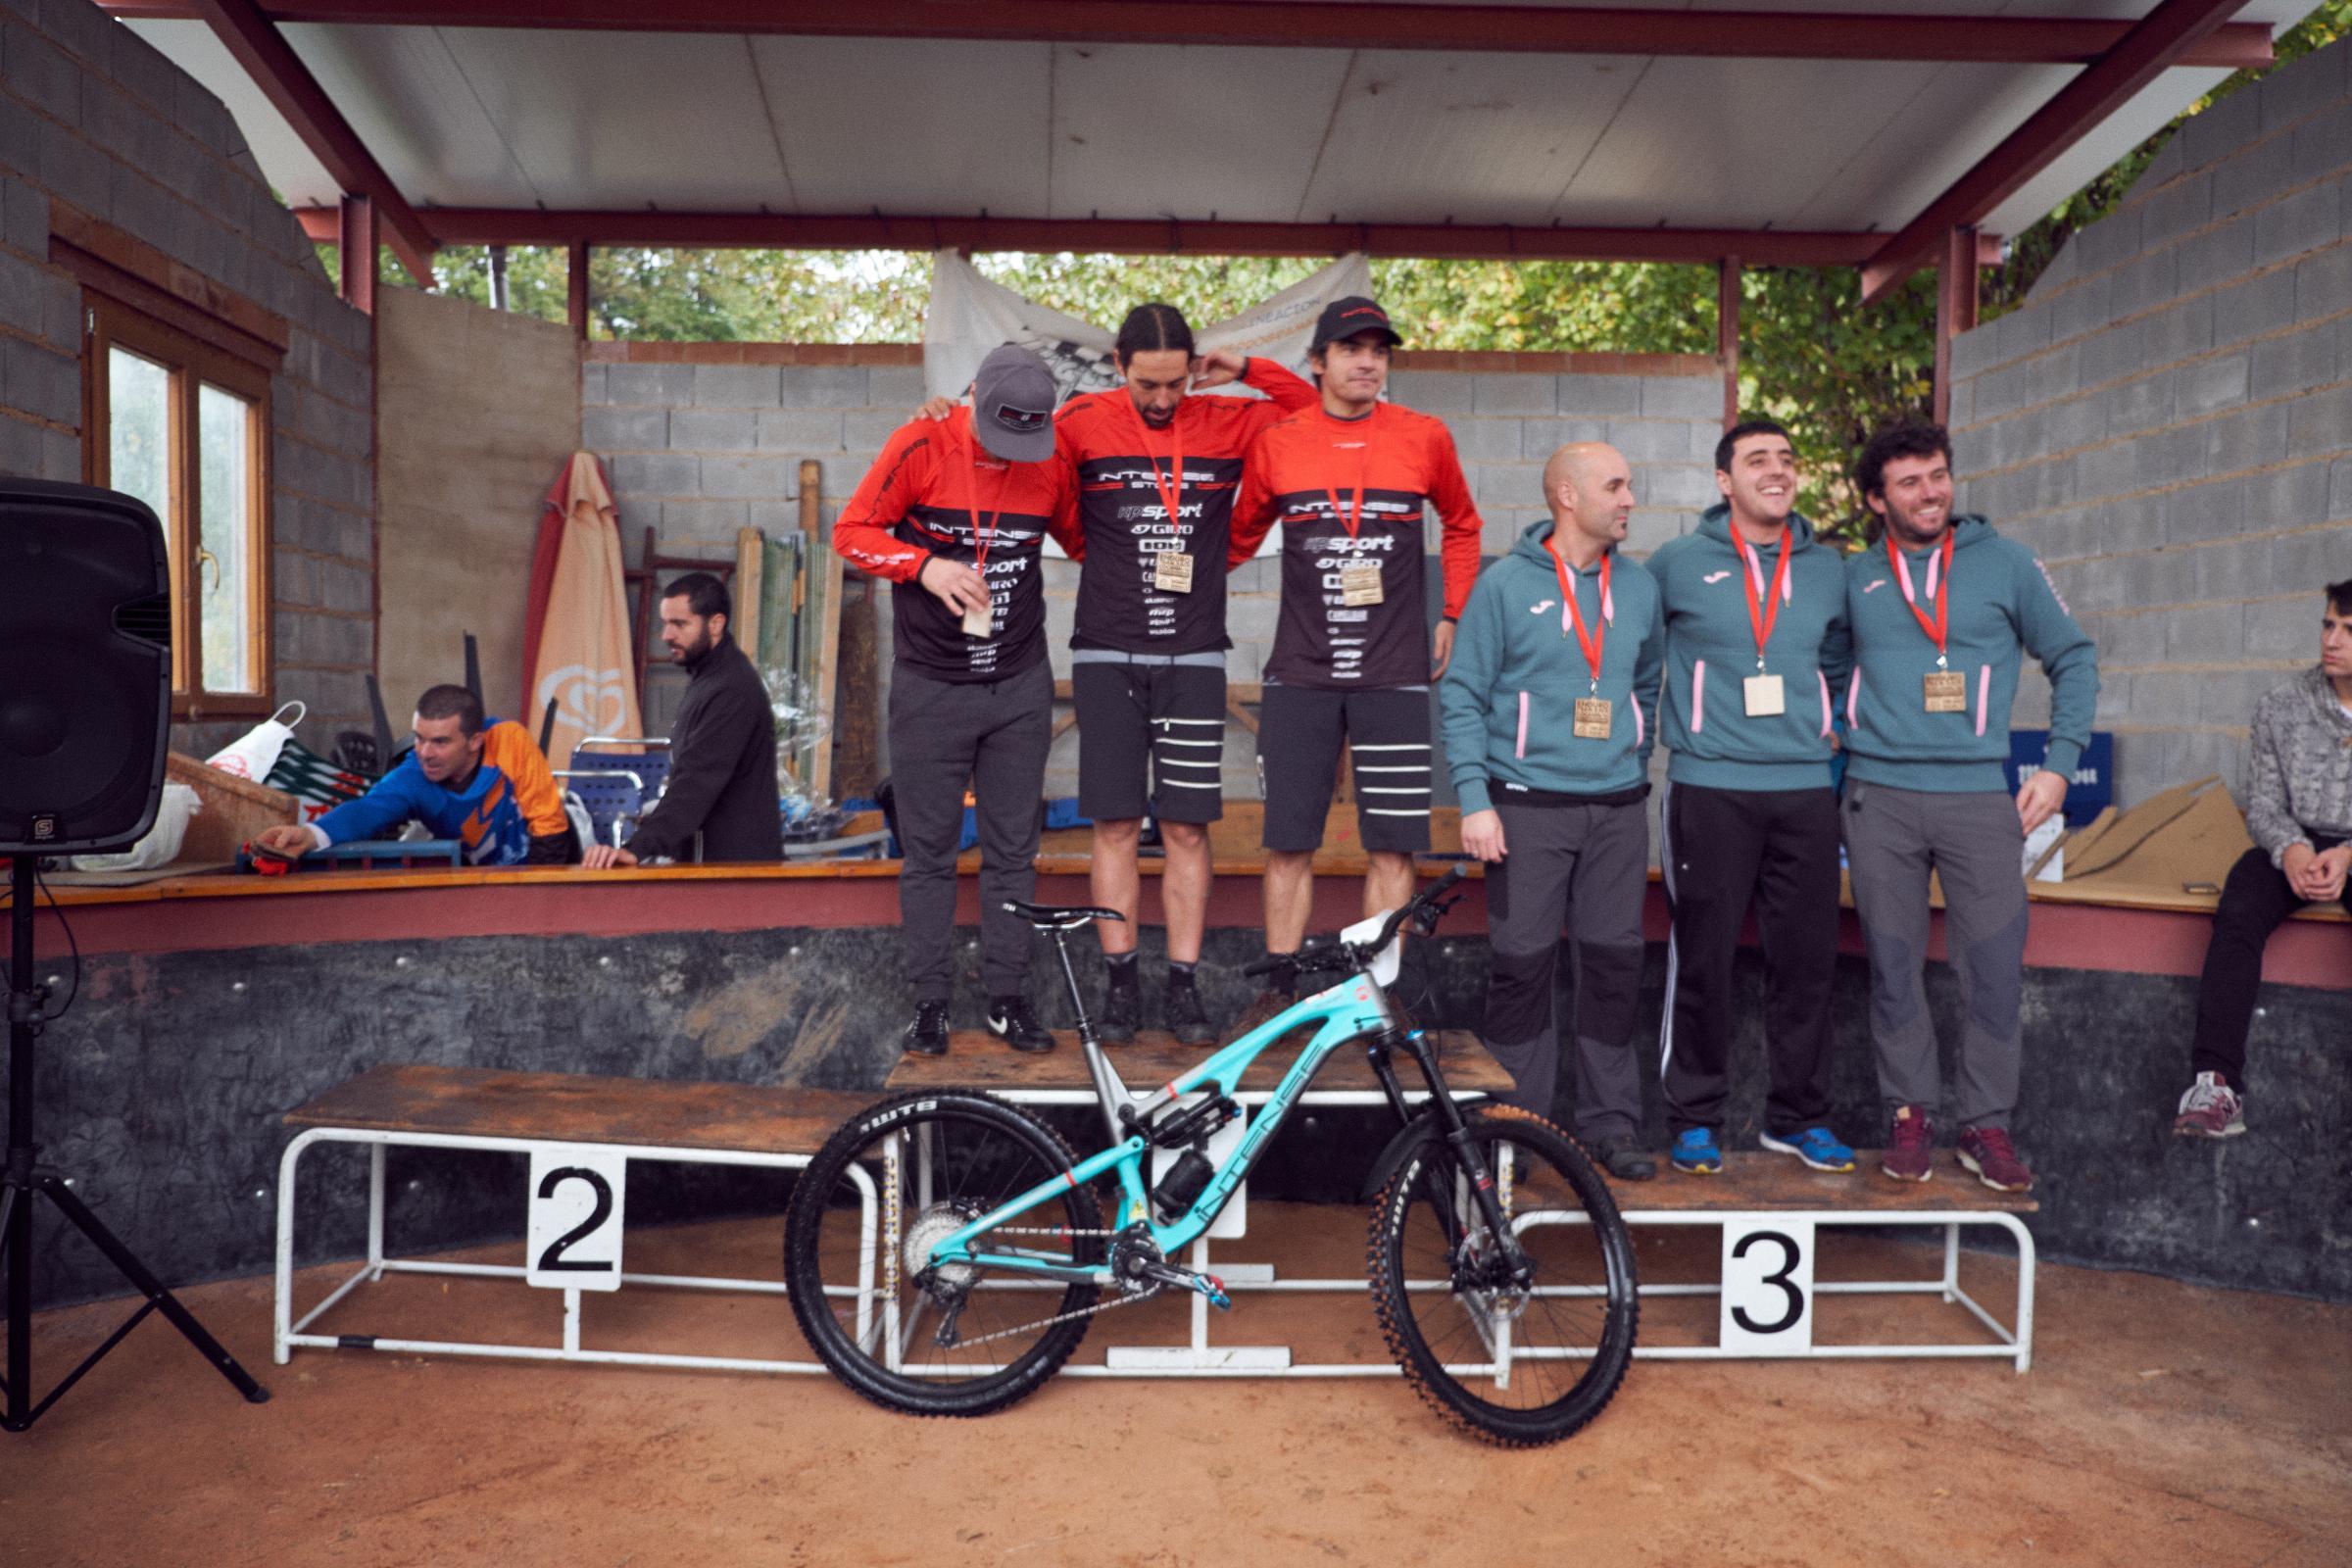 podium-e3